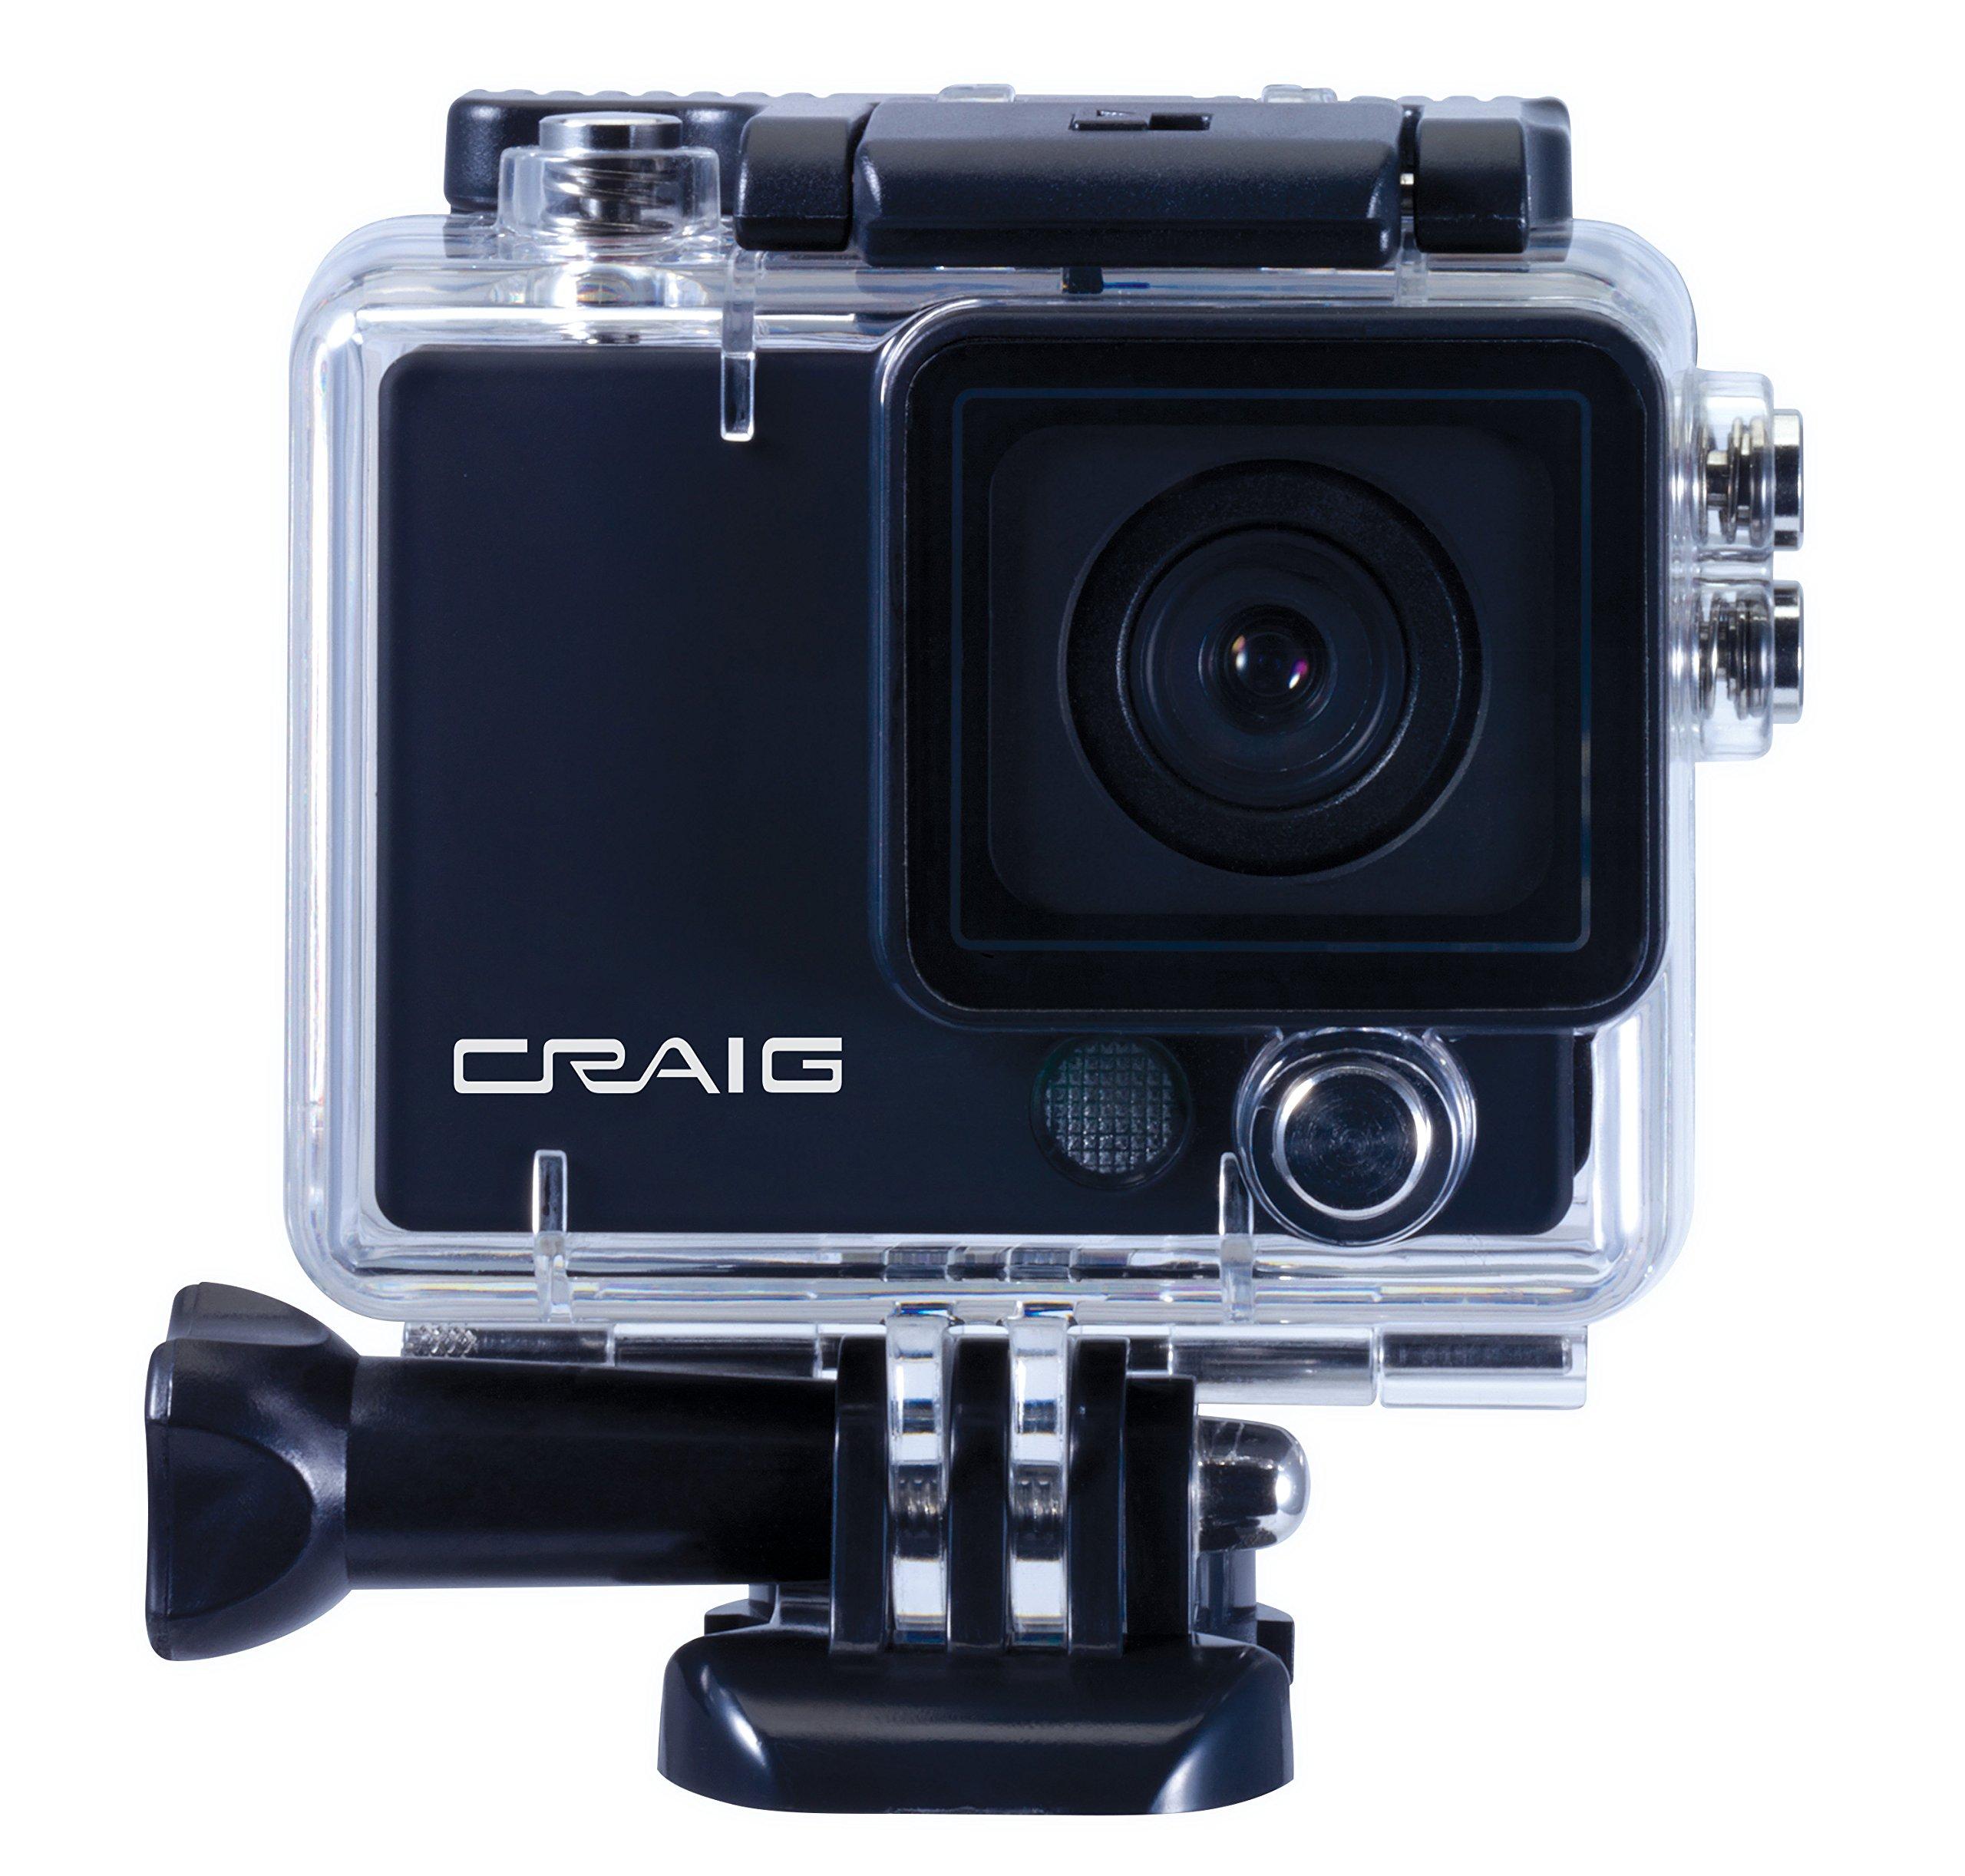 Craig Electronics CCR9029 HD 1080P Action Camera & Video Recorder (Black)